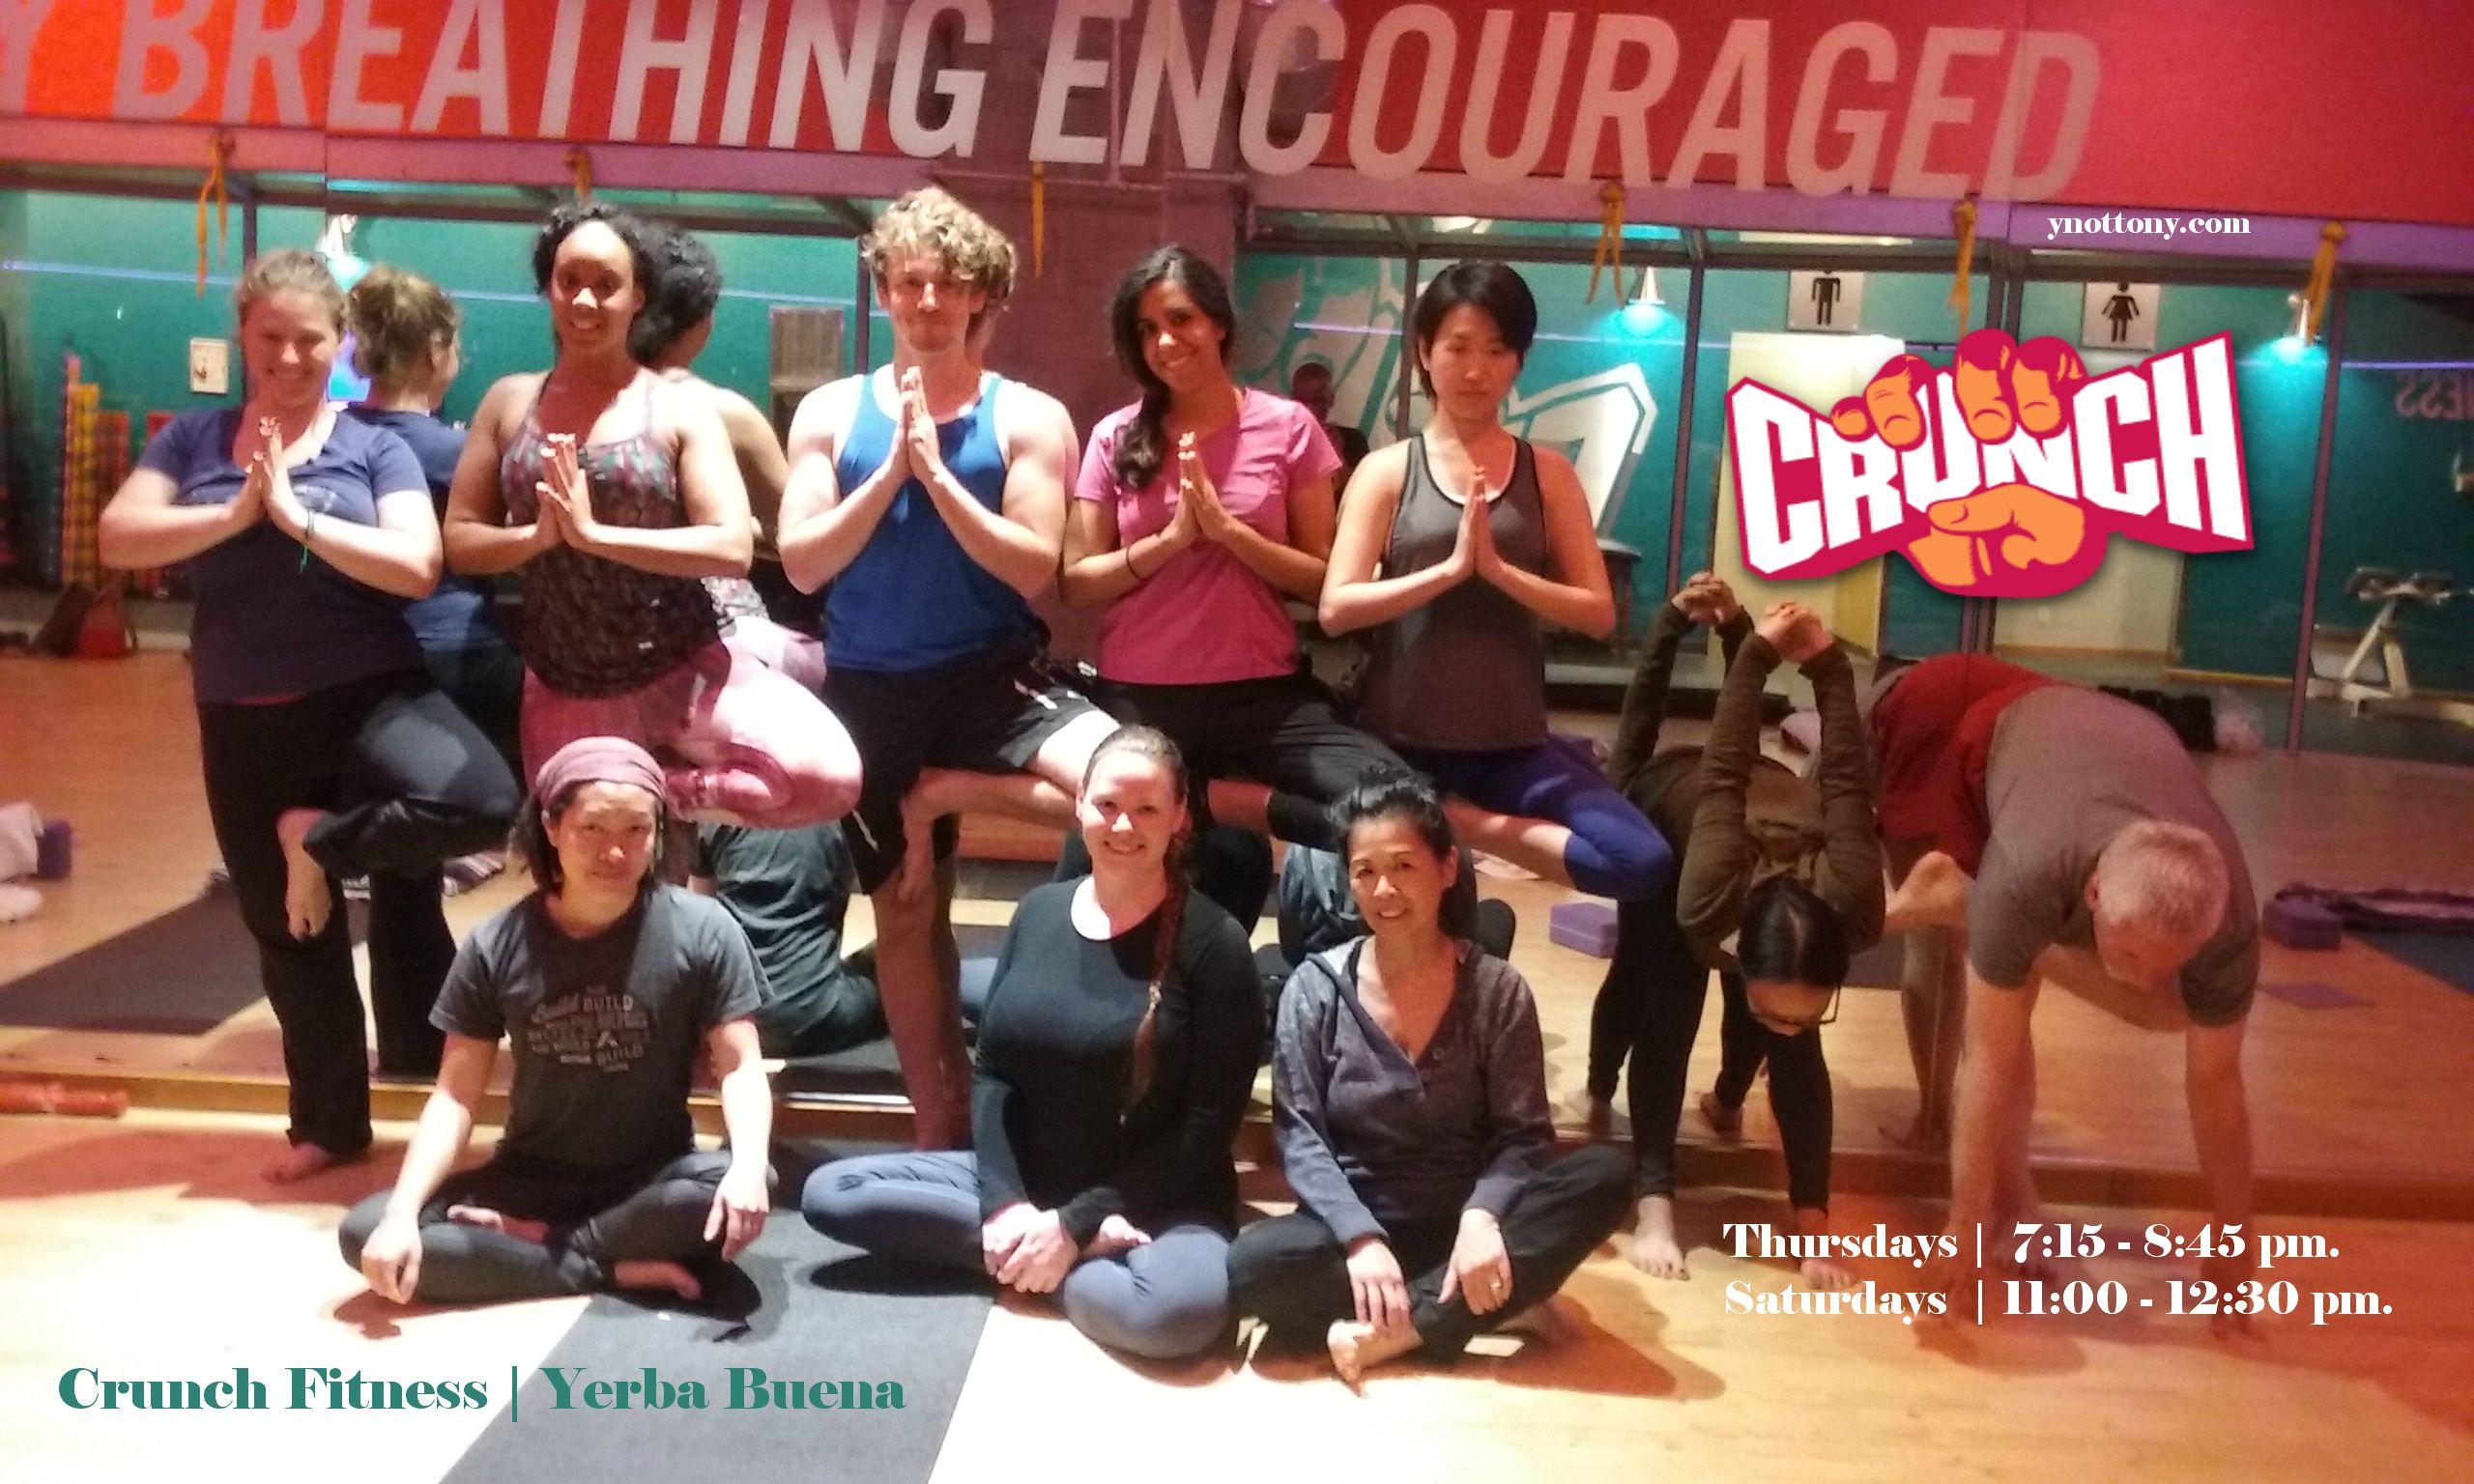 Crunch fitness yerba buena a yoga class last night